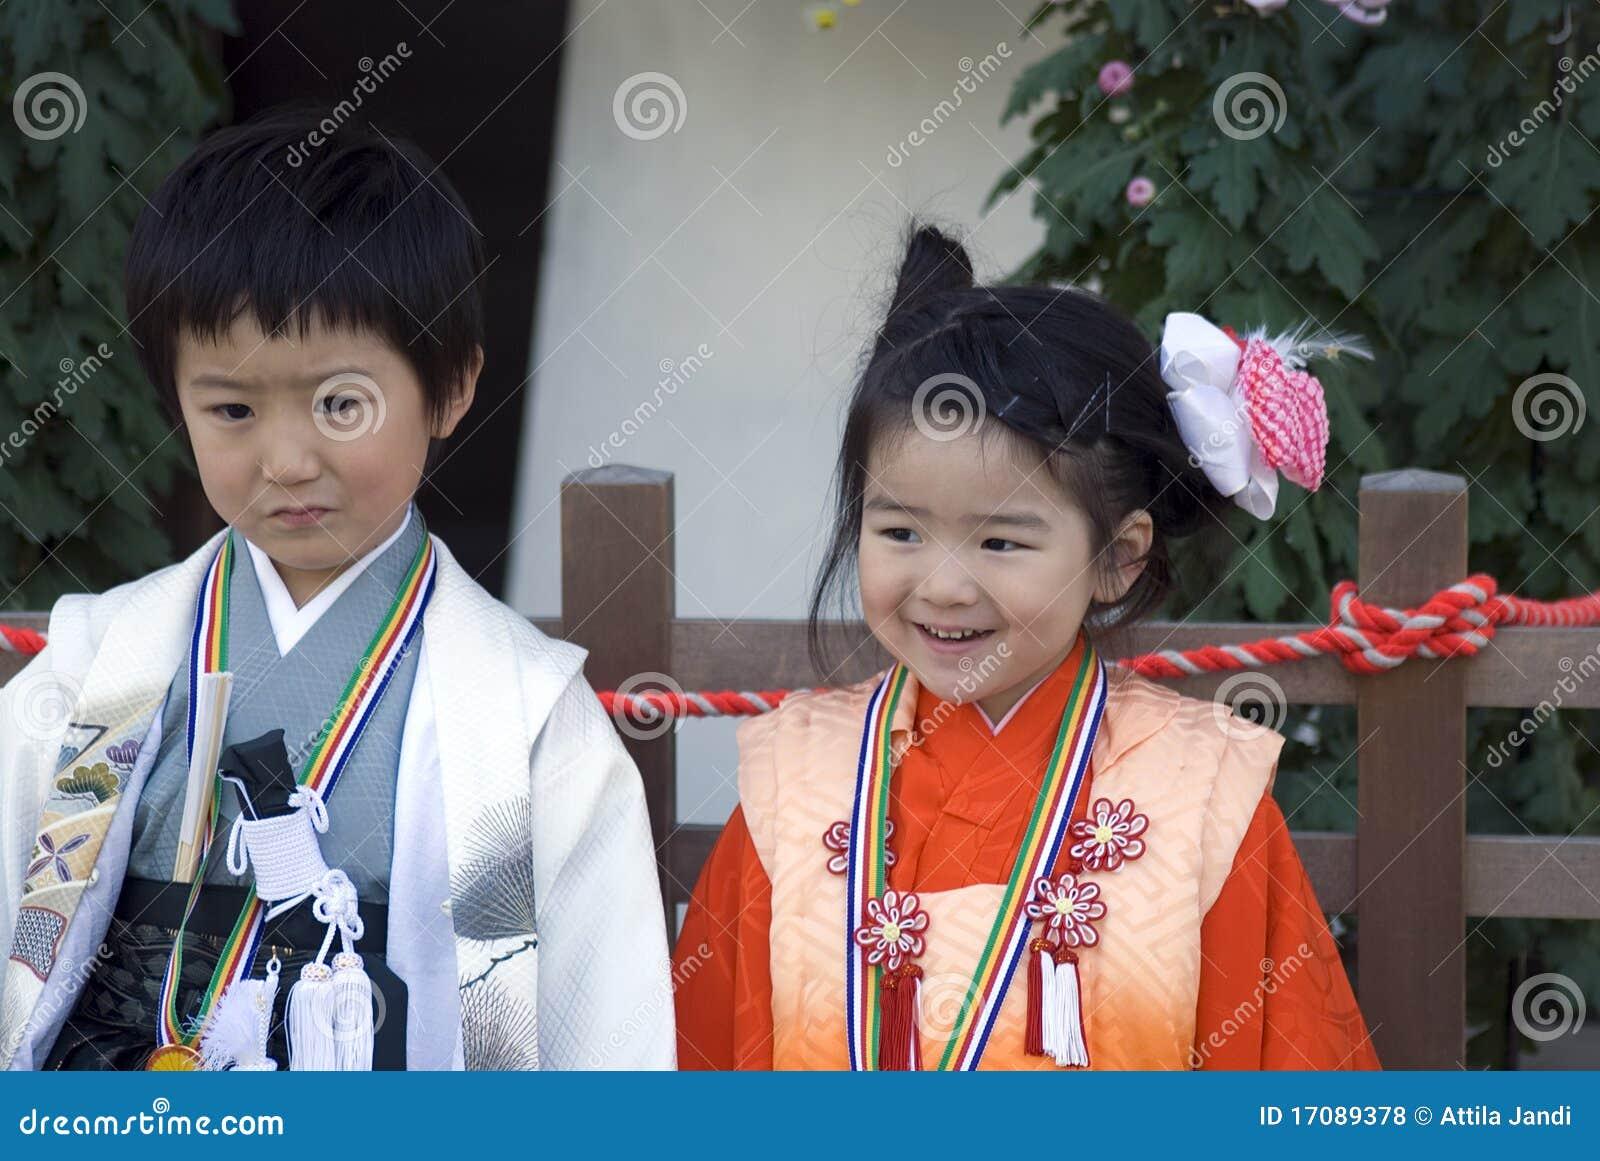 Young Girl And Boy In Kimono, Tokyo, Japan Editorial Stock ... - photo#50